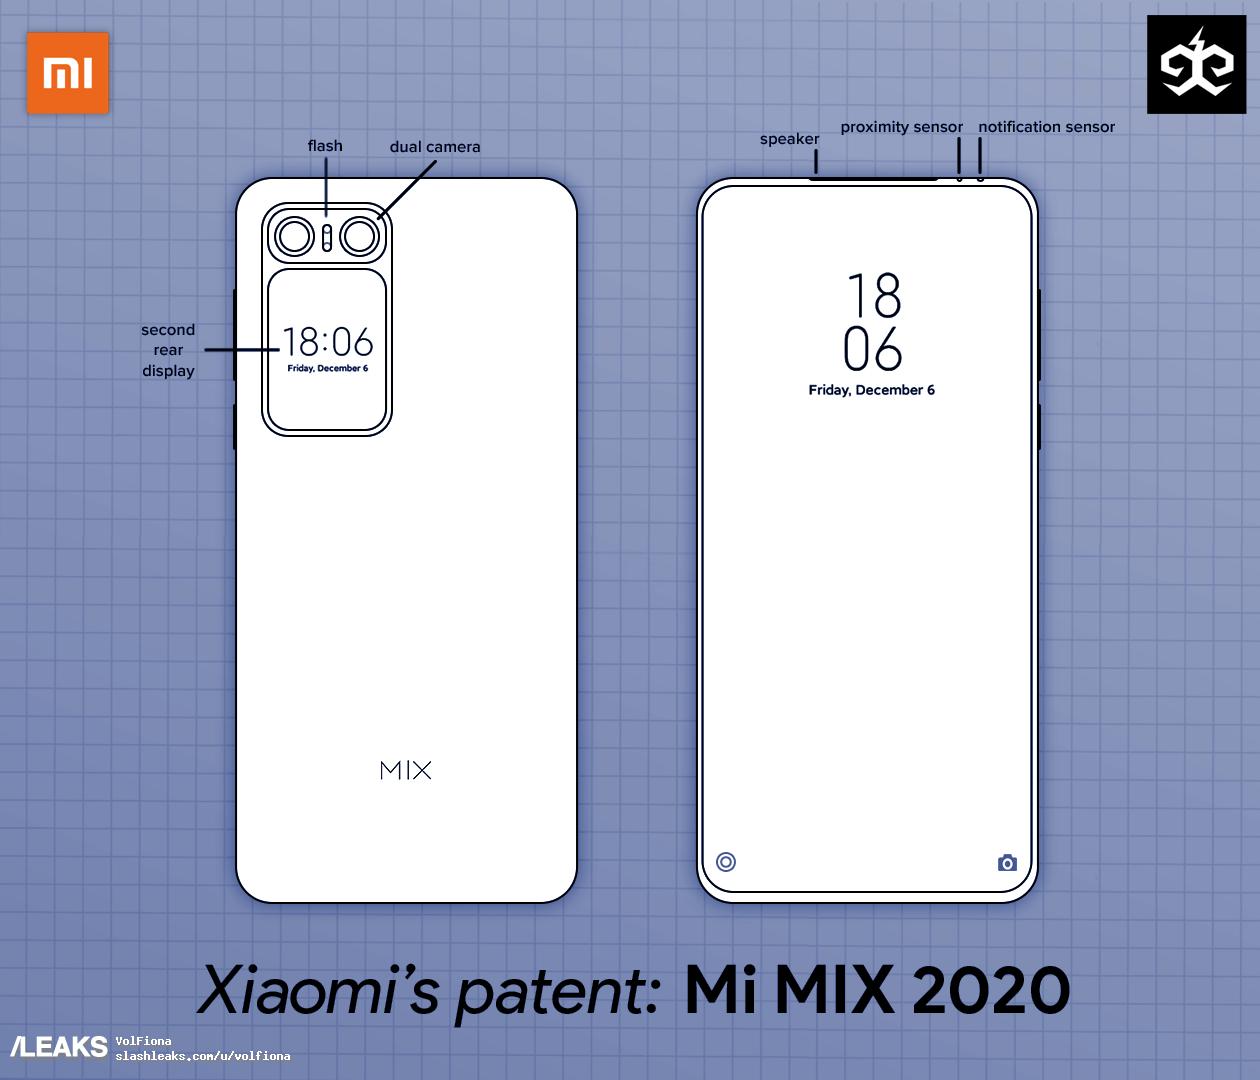 bozza Xiaomi MI MIX 2020